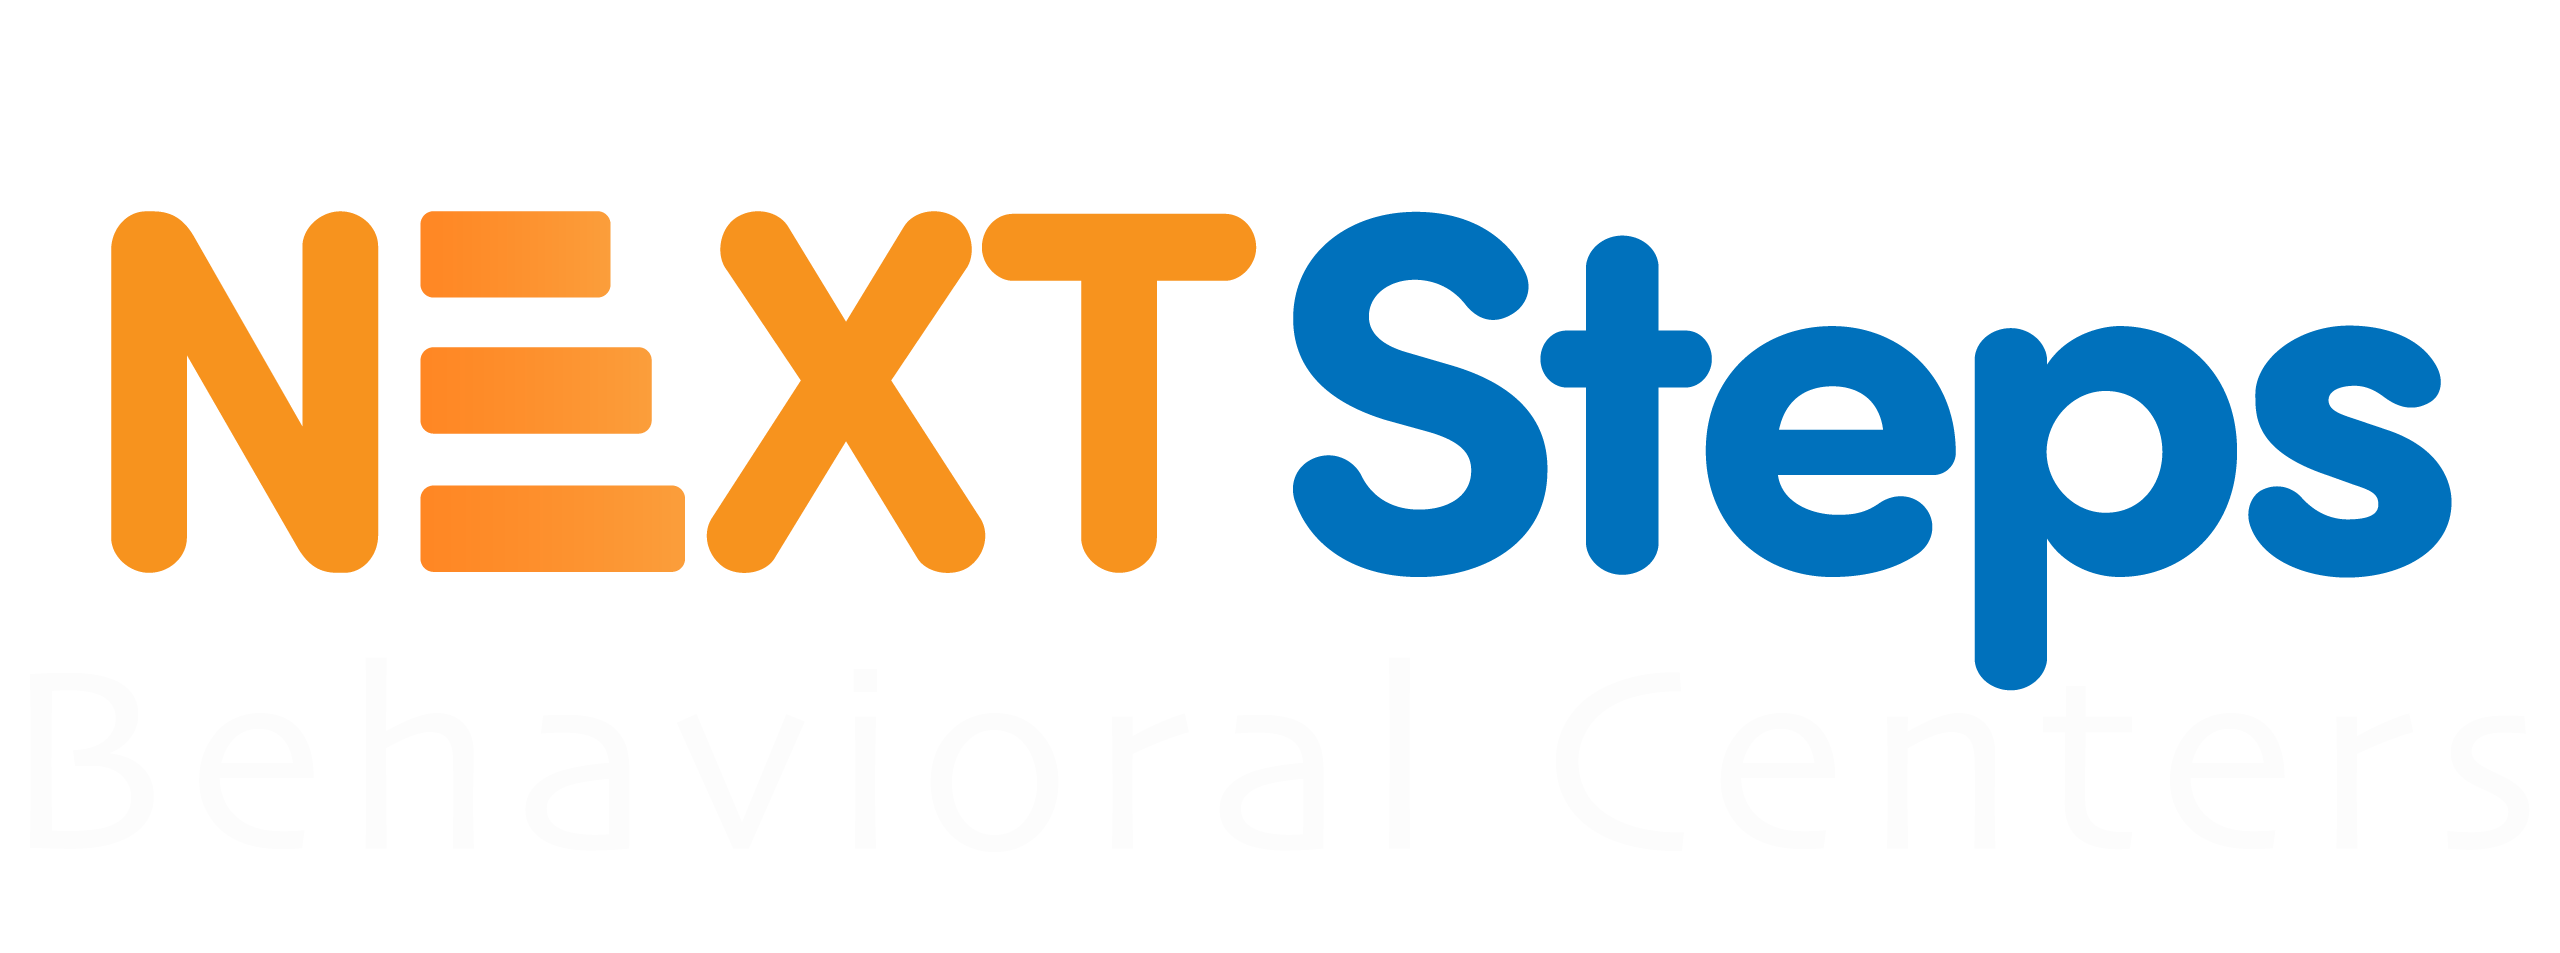 Next Steps Behavioral Centers Logo